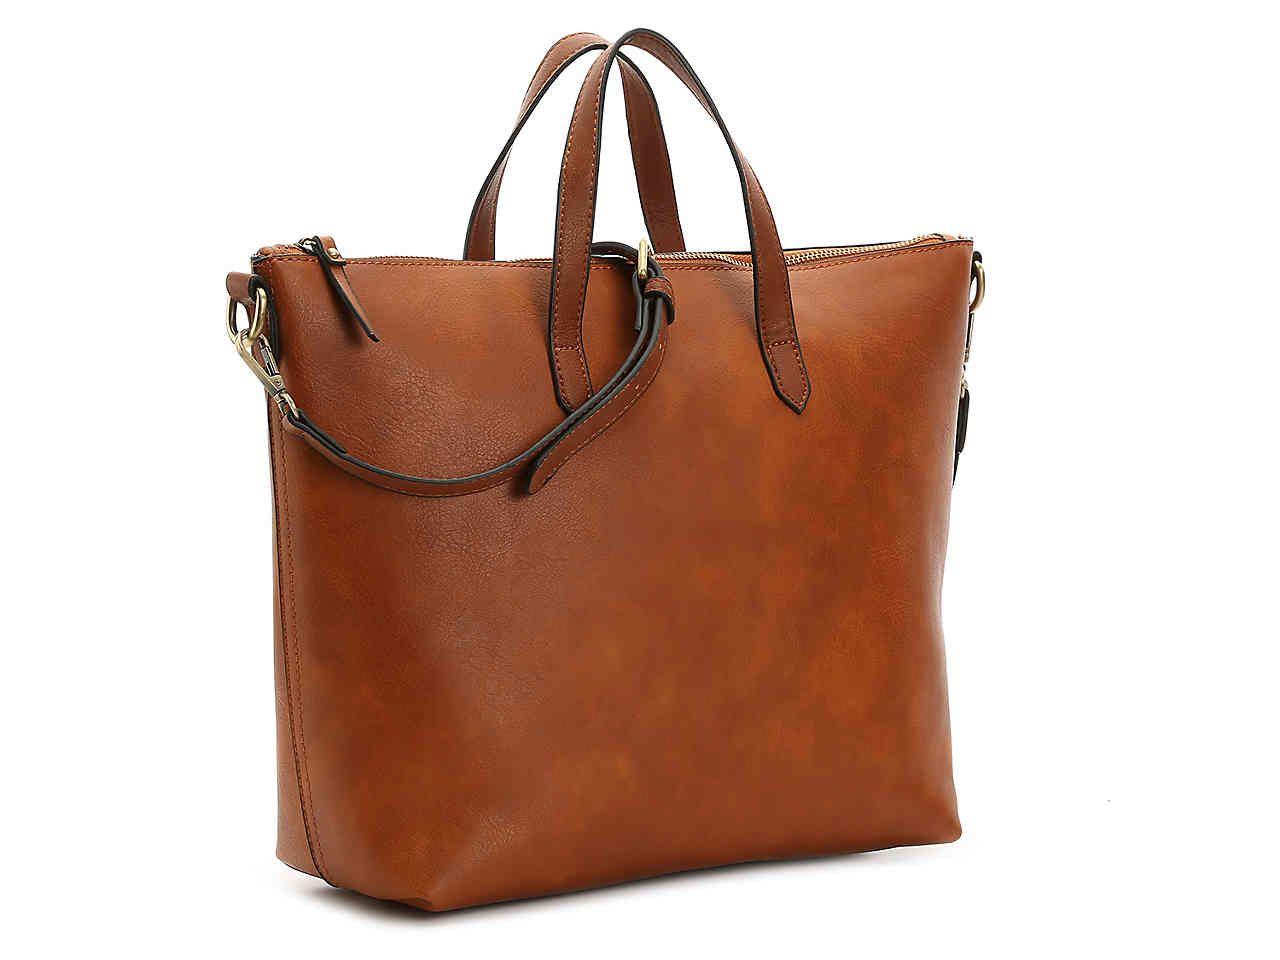 4fe9ea60fcf1 Kate + Alex Cuffaro Top Zip Tote Women's Handbags & Accessories ...